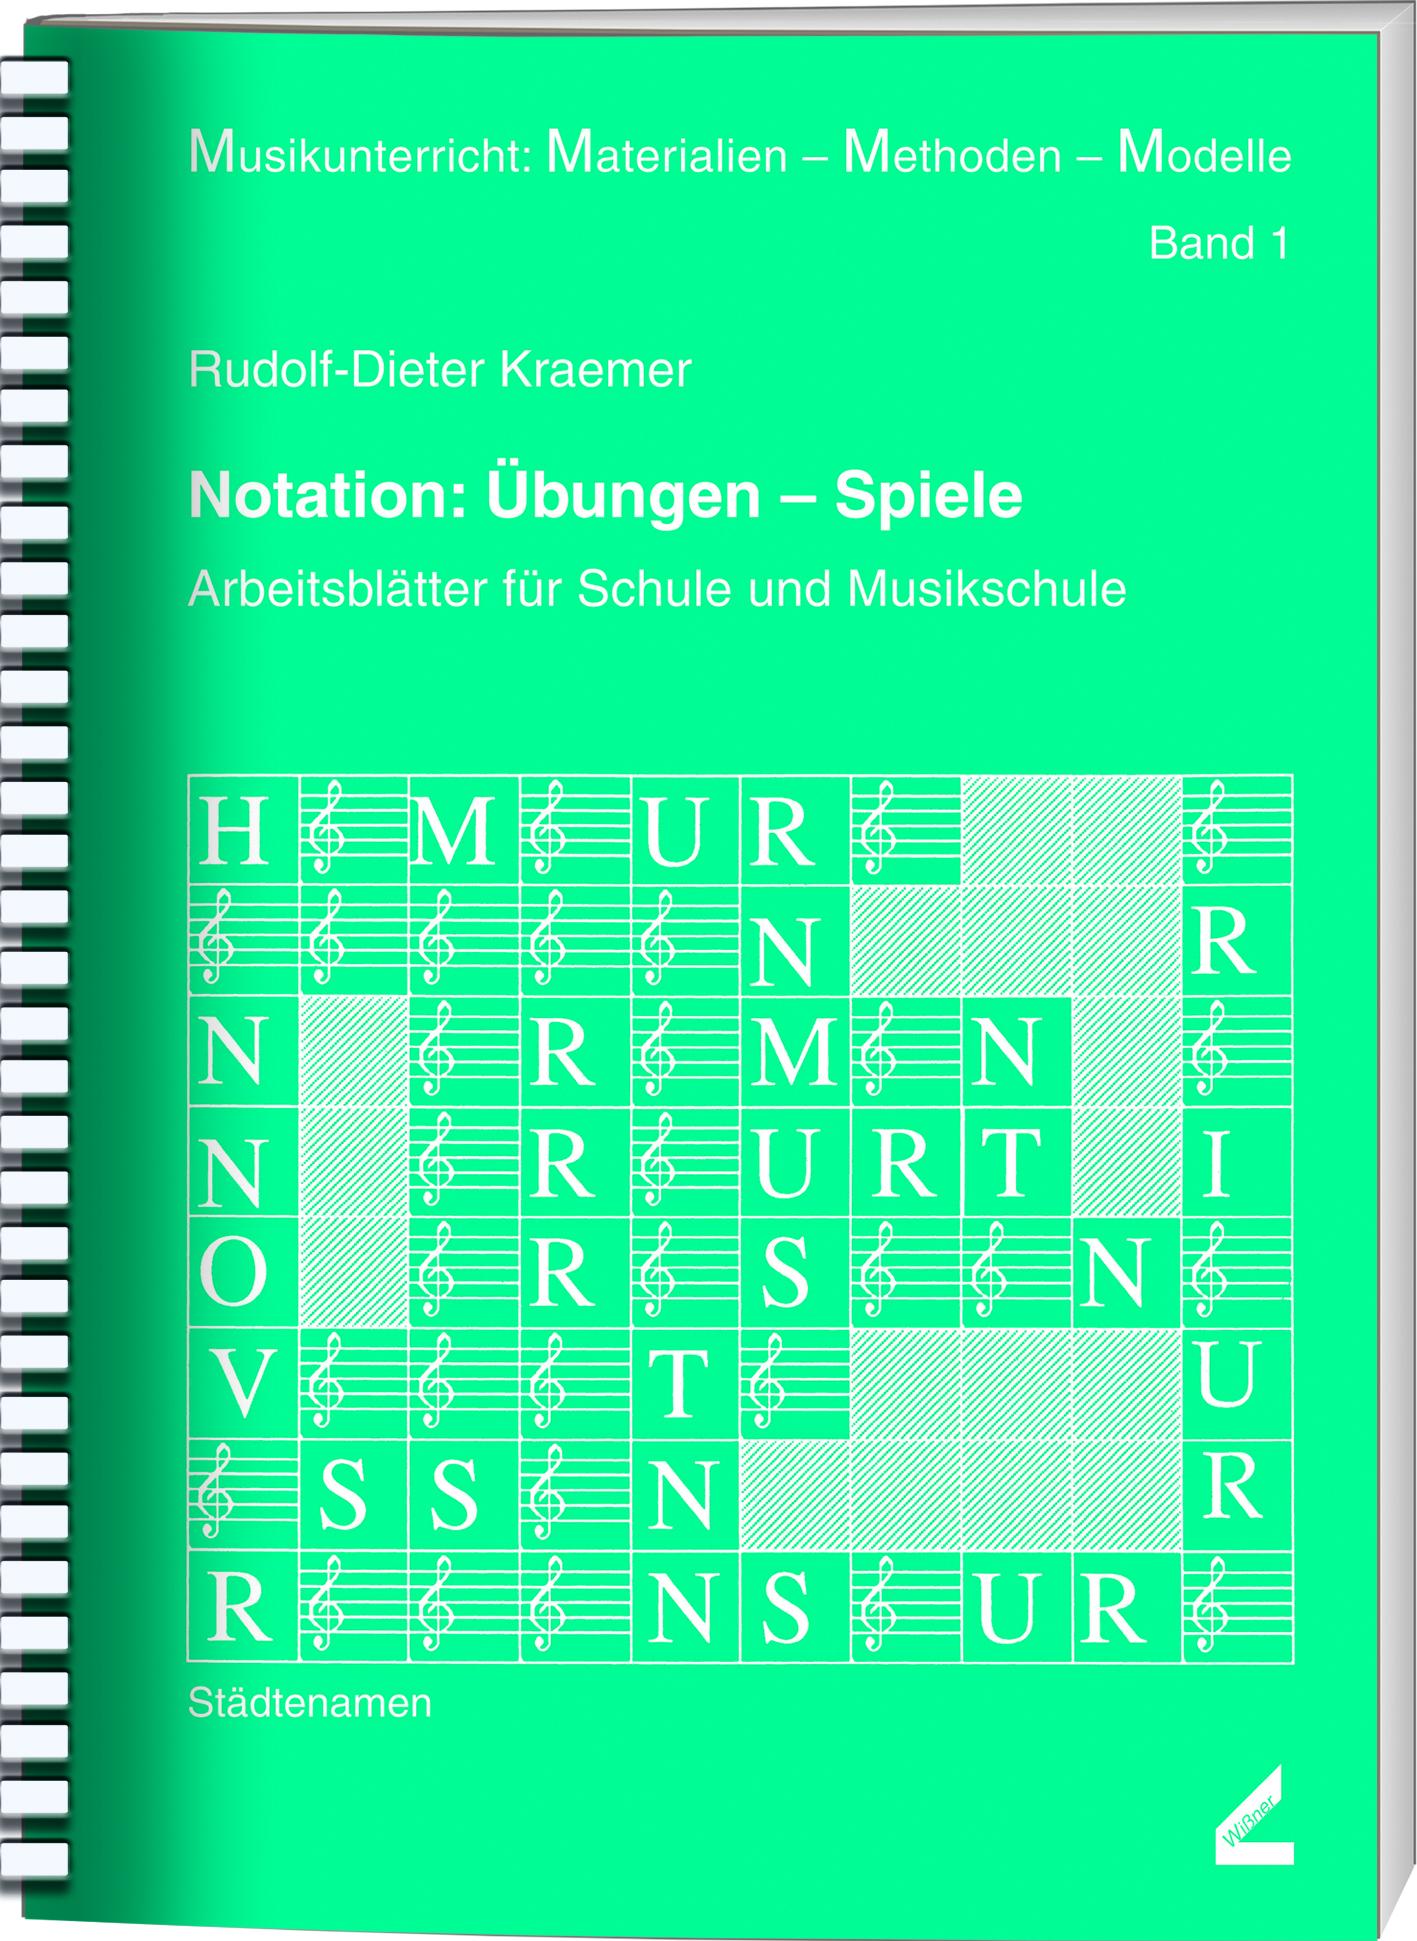 Musikunterricht: Materialien – Methoden – Modelle: Notation: Übungen ...